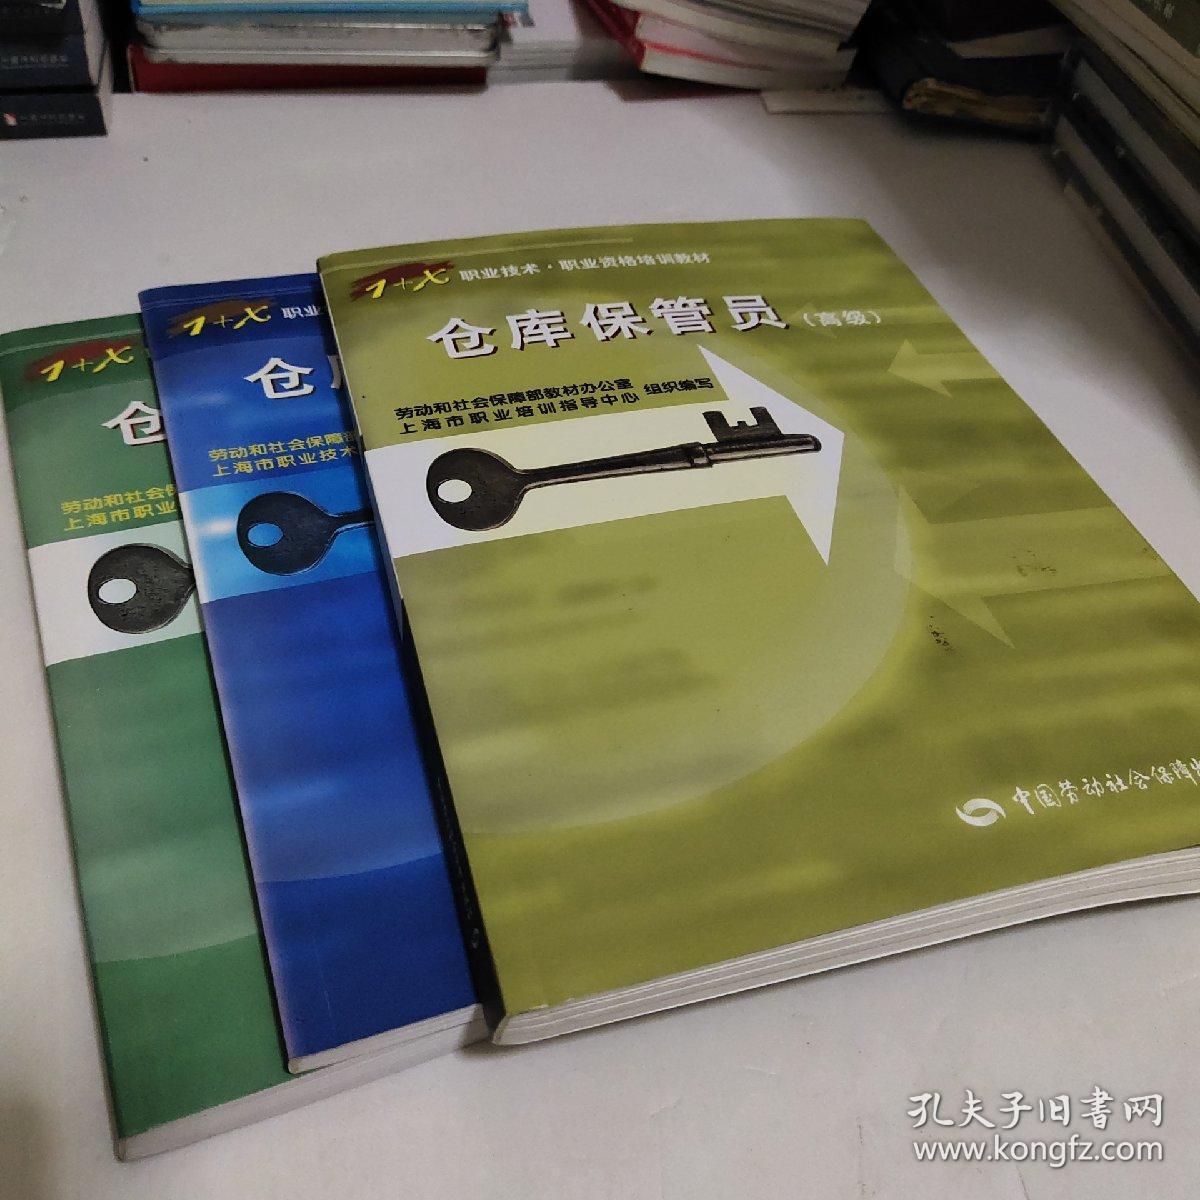 1+X职业技术·职业资格培训教材:仓库保管员(初级 中级 高级)3本合售